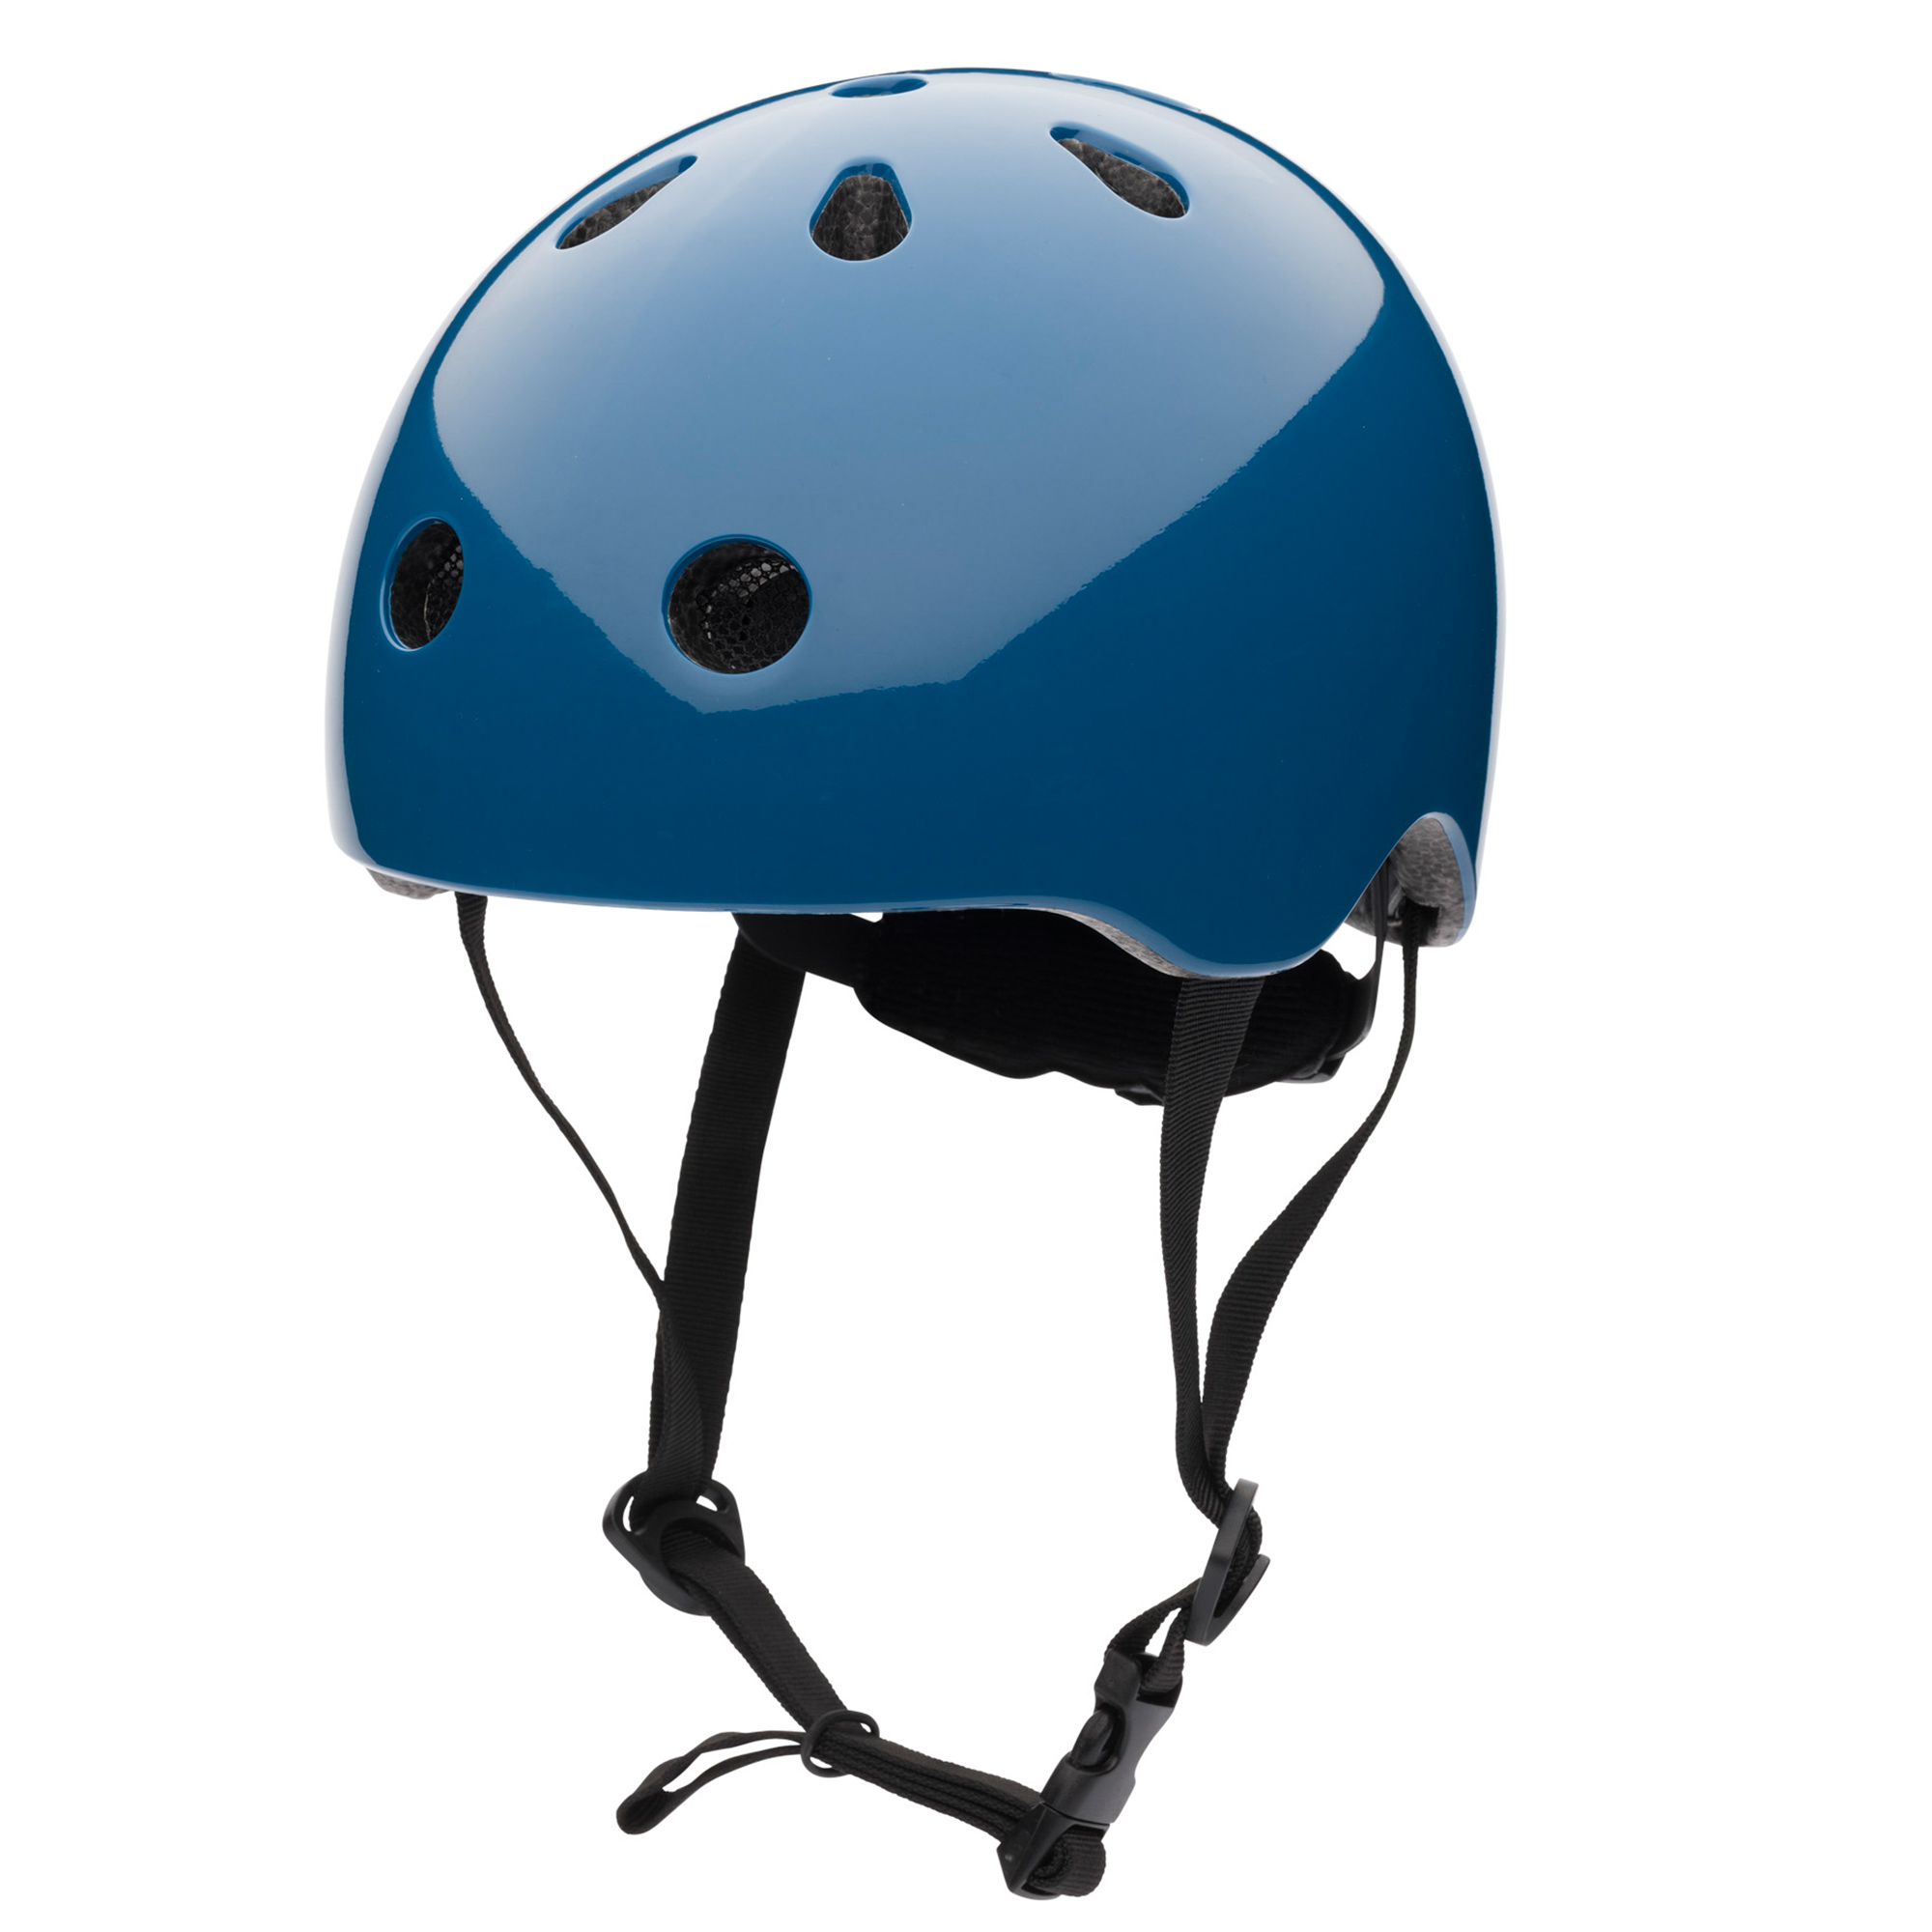 Trybike - CoConut Cykelhjelm, Antracit Grå (S) | cykelhjelm